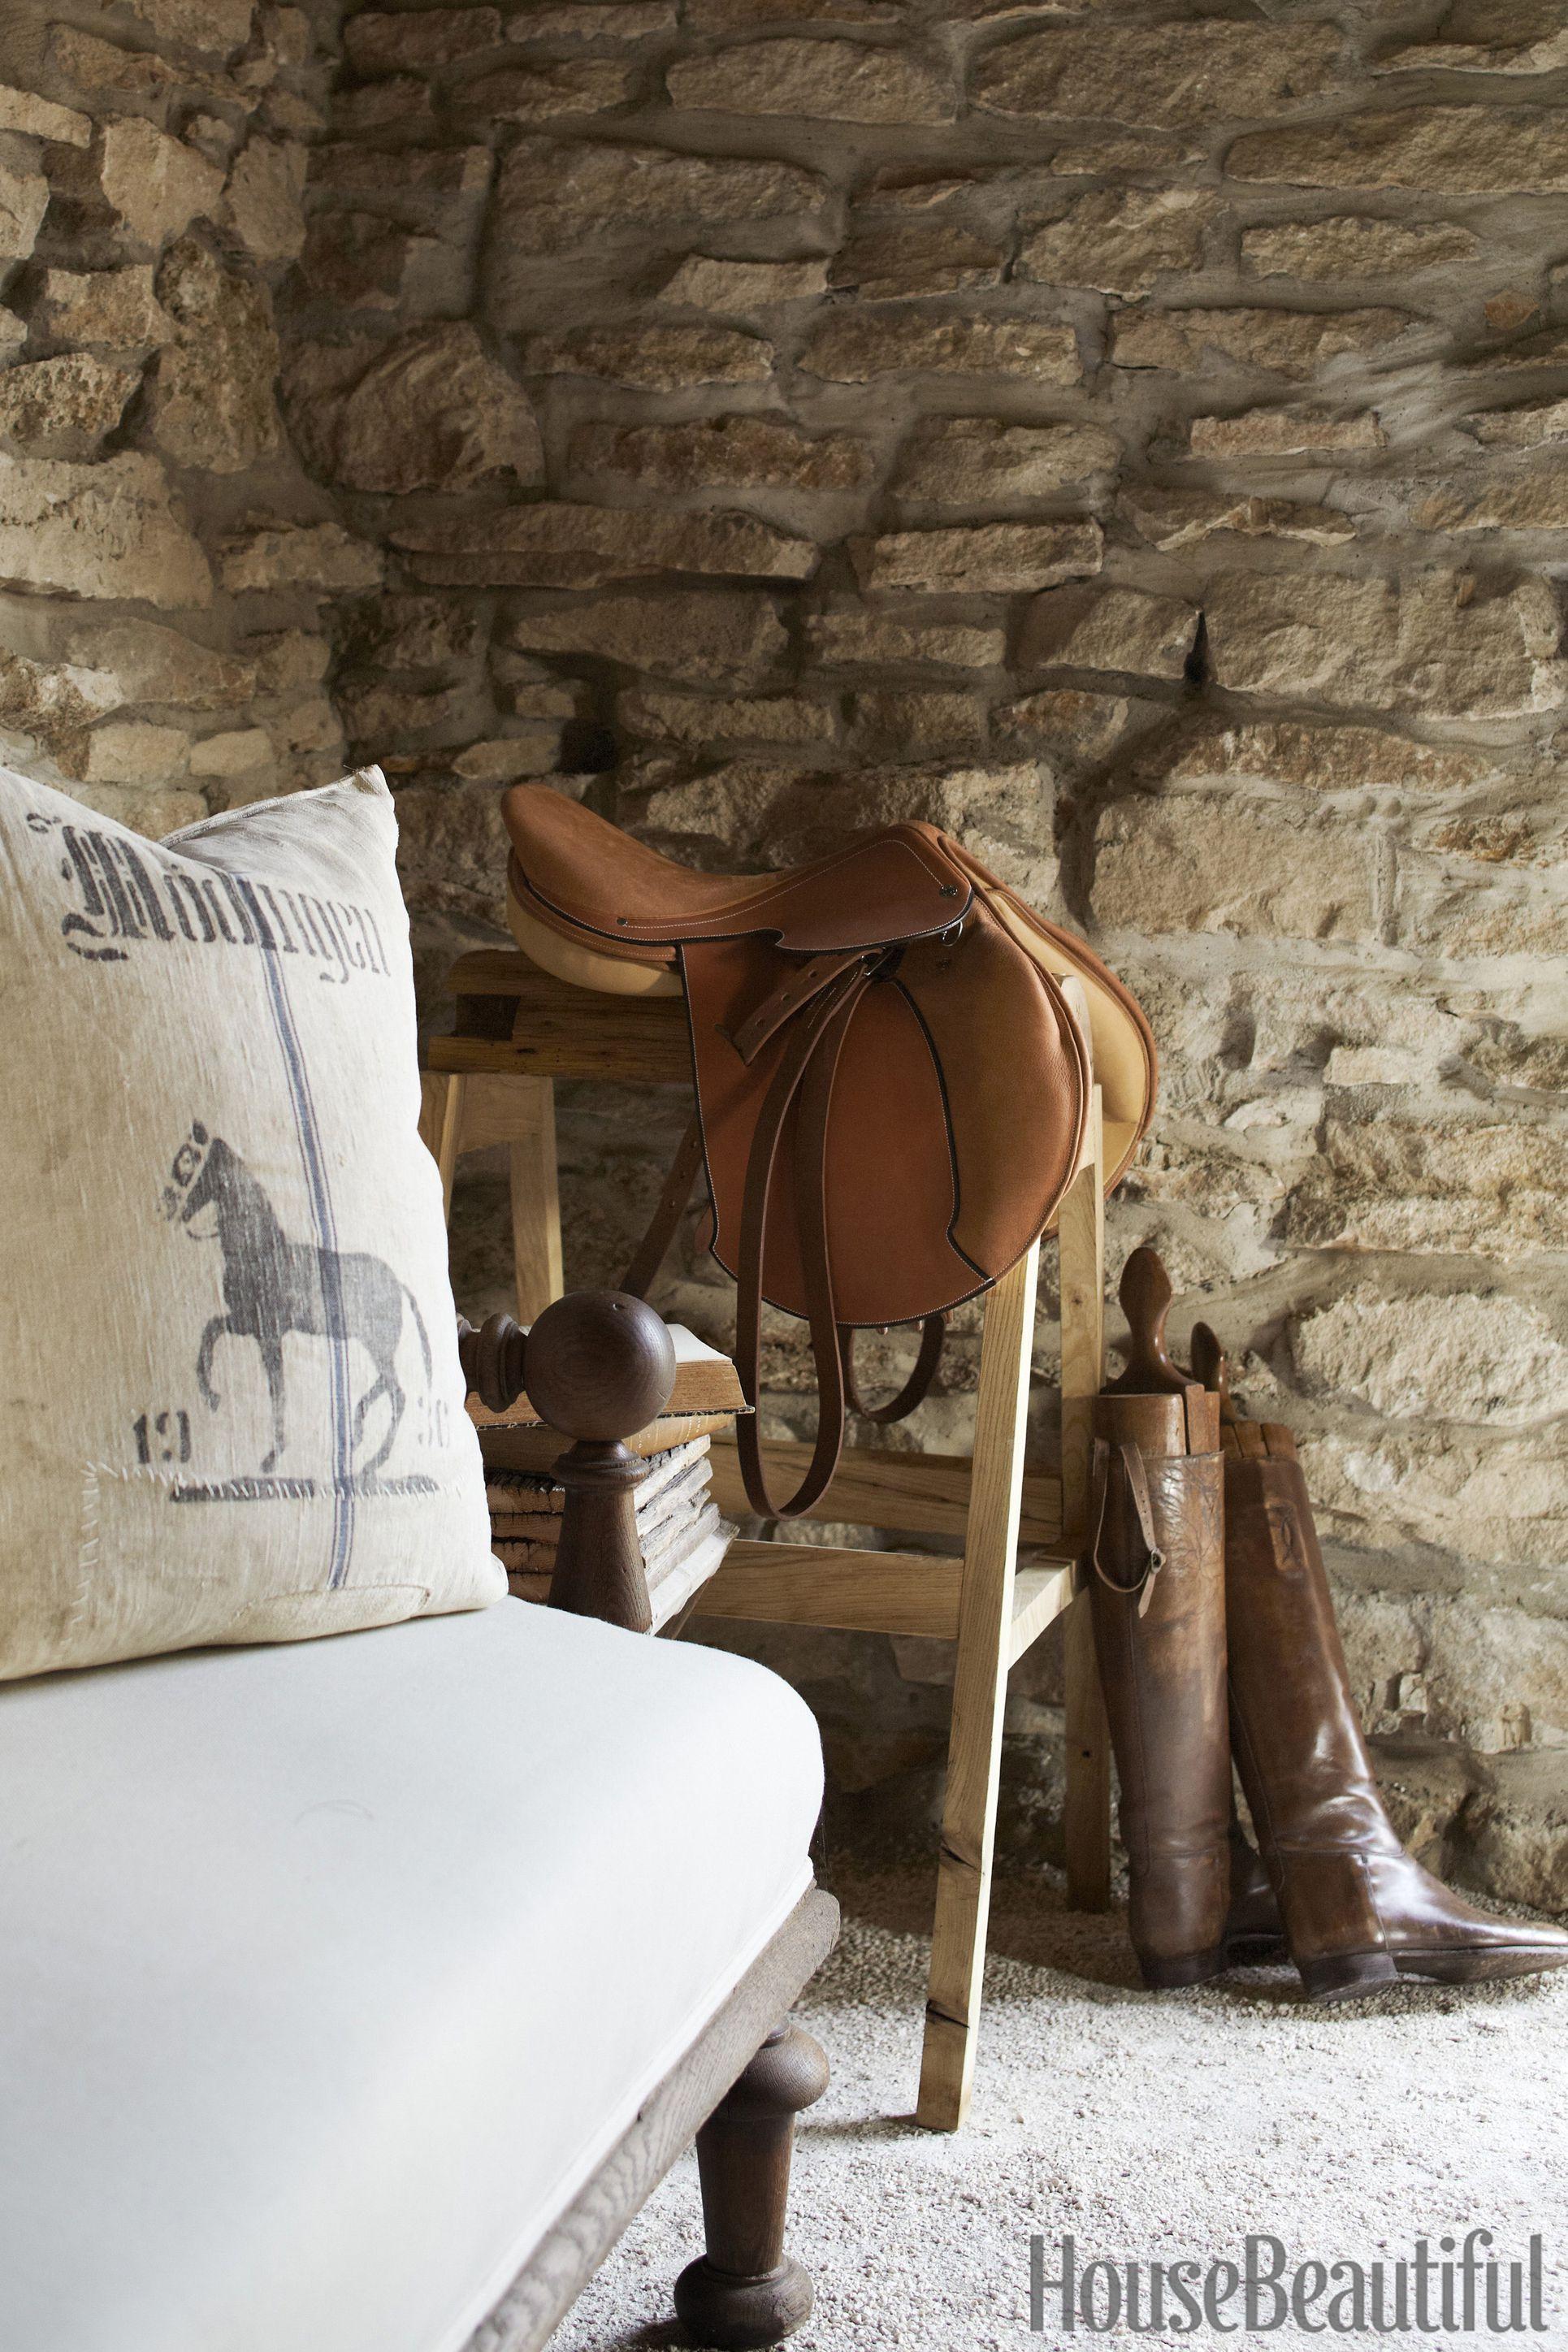 annie-brahler-smith-hermes-jumping-saddle-0617.jpg